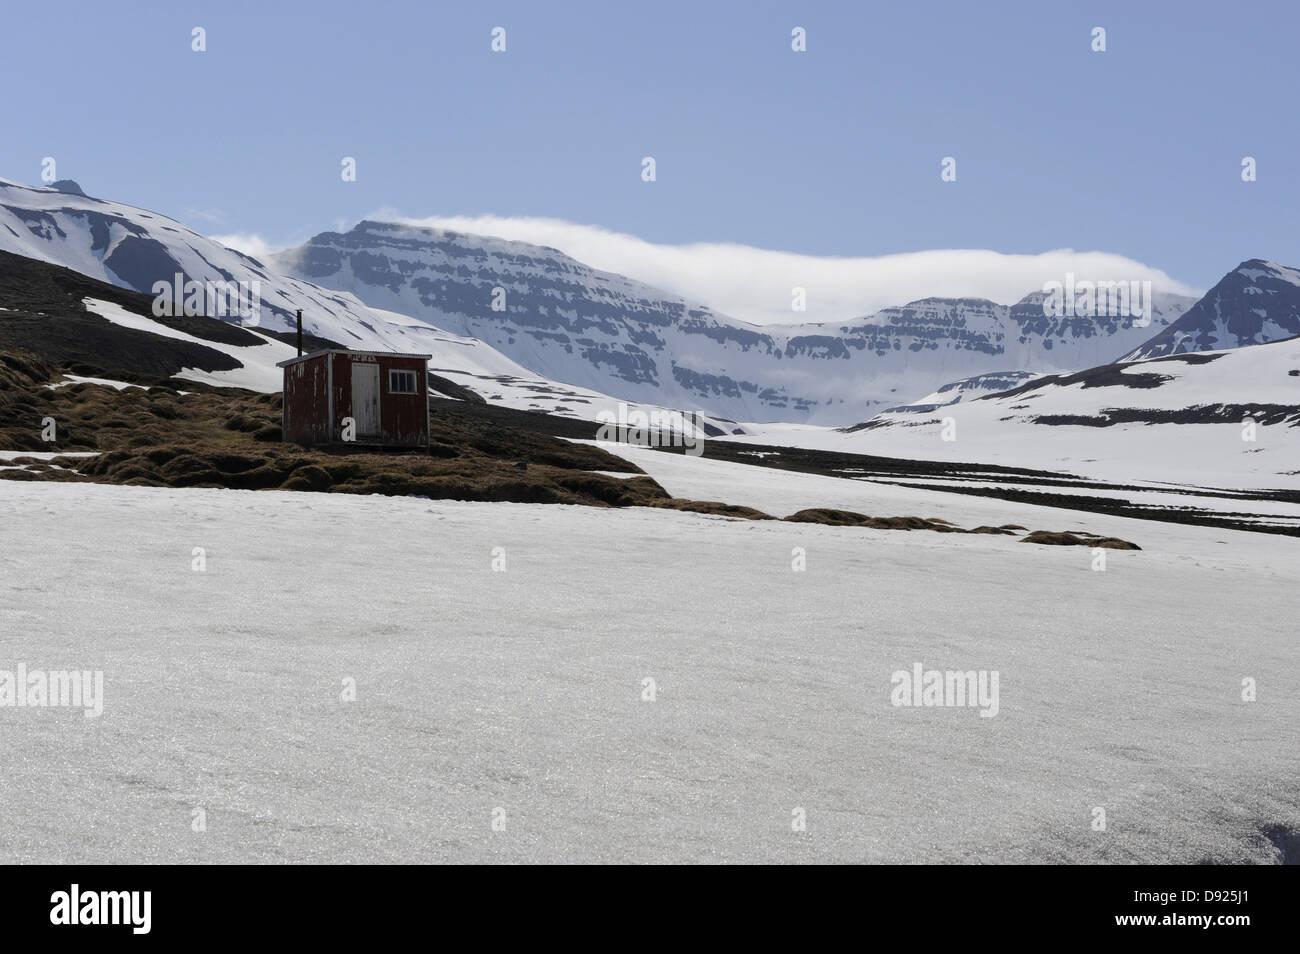 Snowfield, Tröllaskagi, North Iceland, May/June 2010 - Stock Image